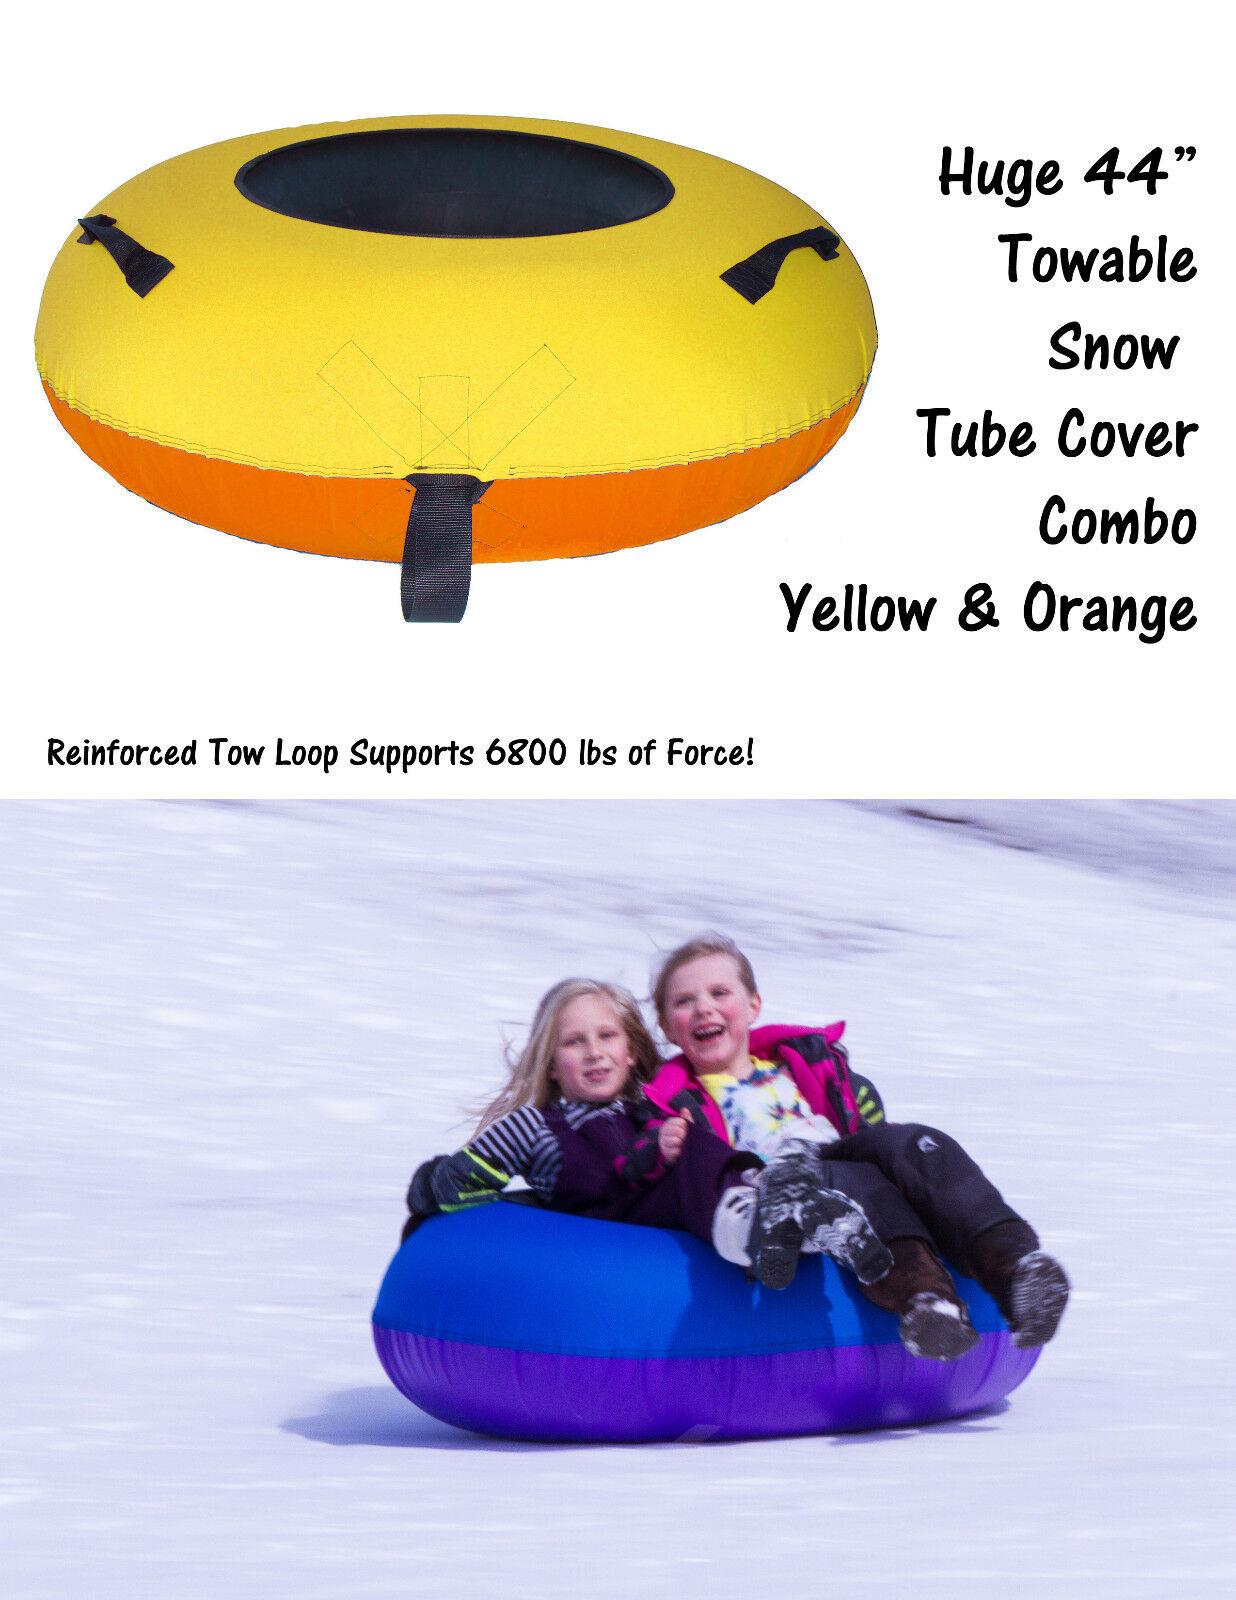 HEAVY DUTY TOW-ABLE SNOW TUBES COMBOS HUGE INNER TUBE SNOW TUBES SLEDDING SLEDS